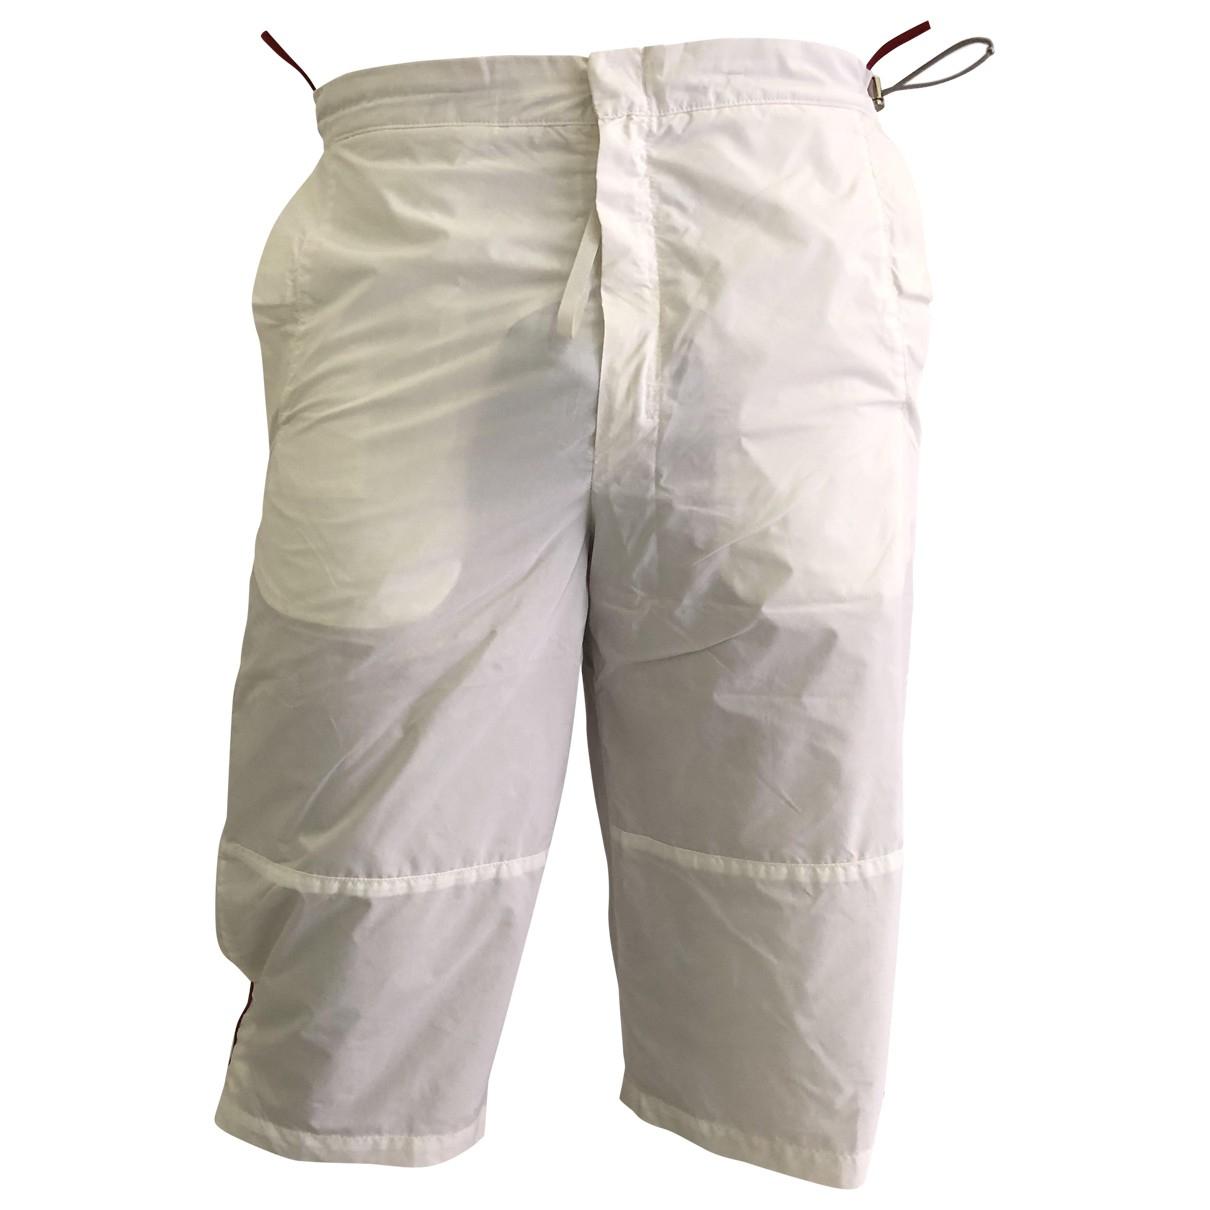 Prada \N Shorts in  Weiss Polyester